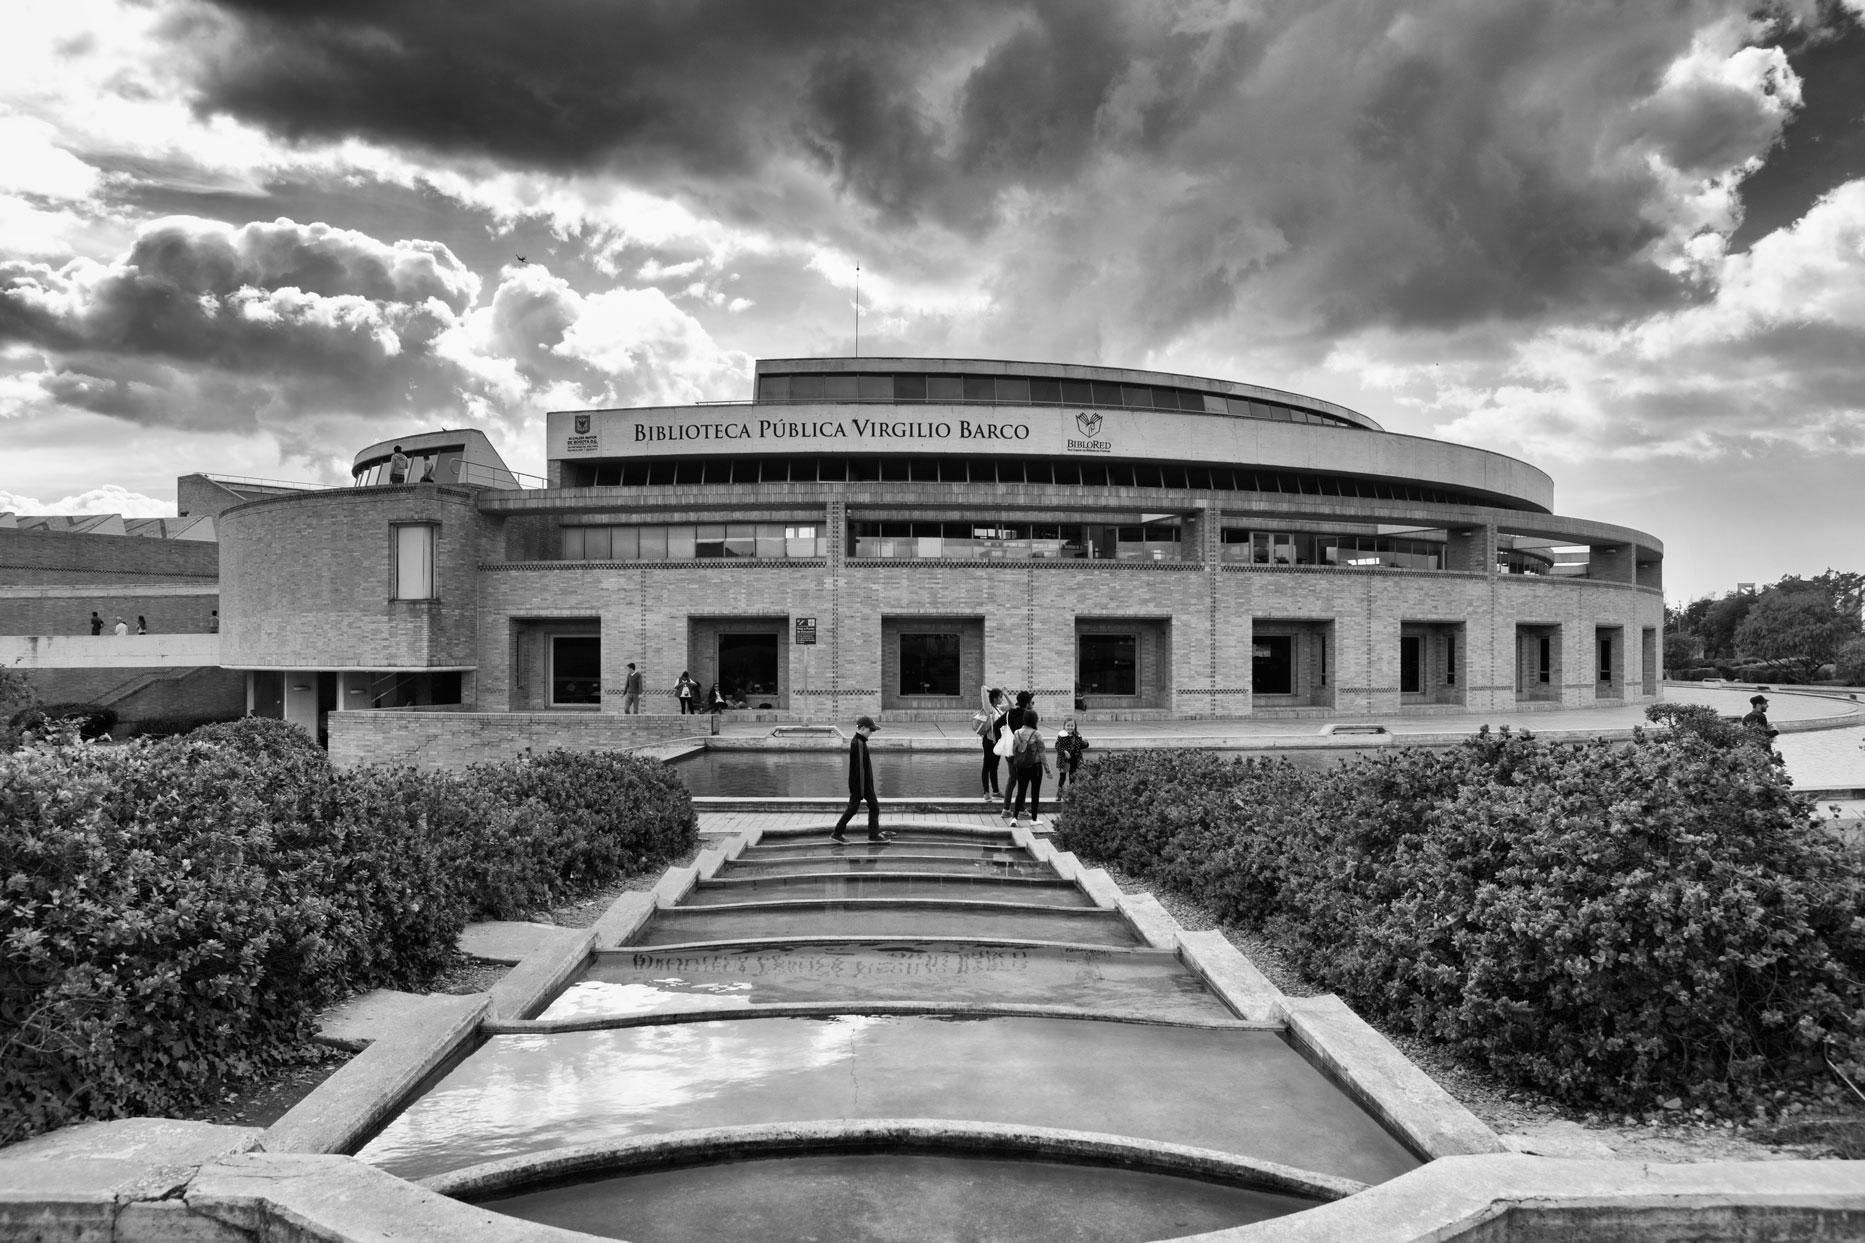 02-simonbosch photography-simon-bosch-architectuur-architecture-bogota-colombia-ArchDaily-Biblioteca Publica Virgilio Barco